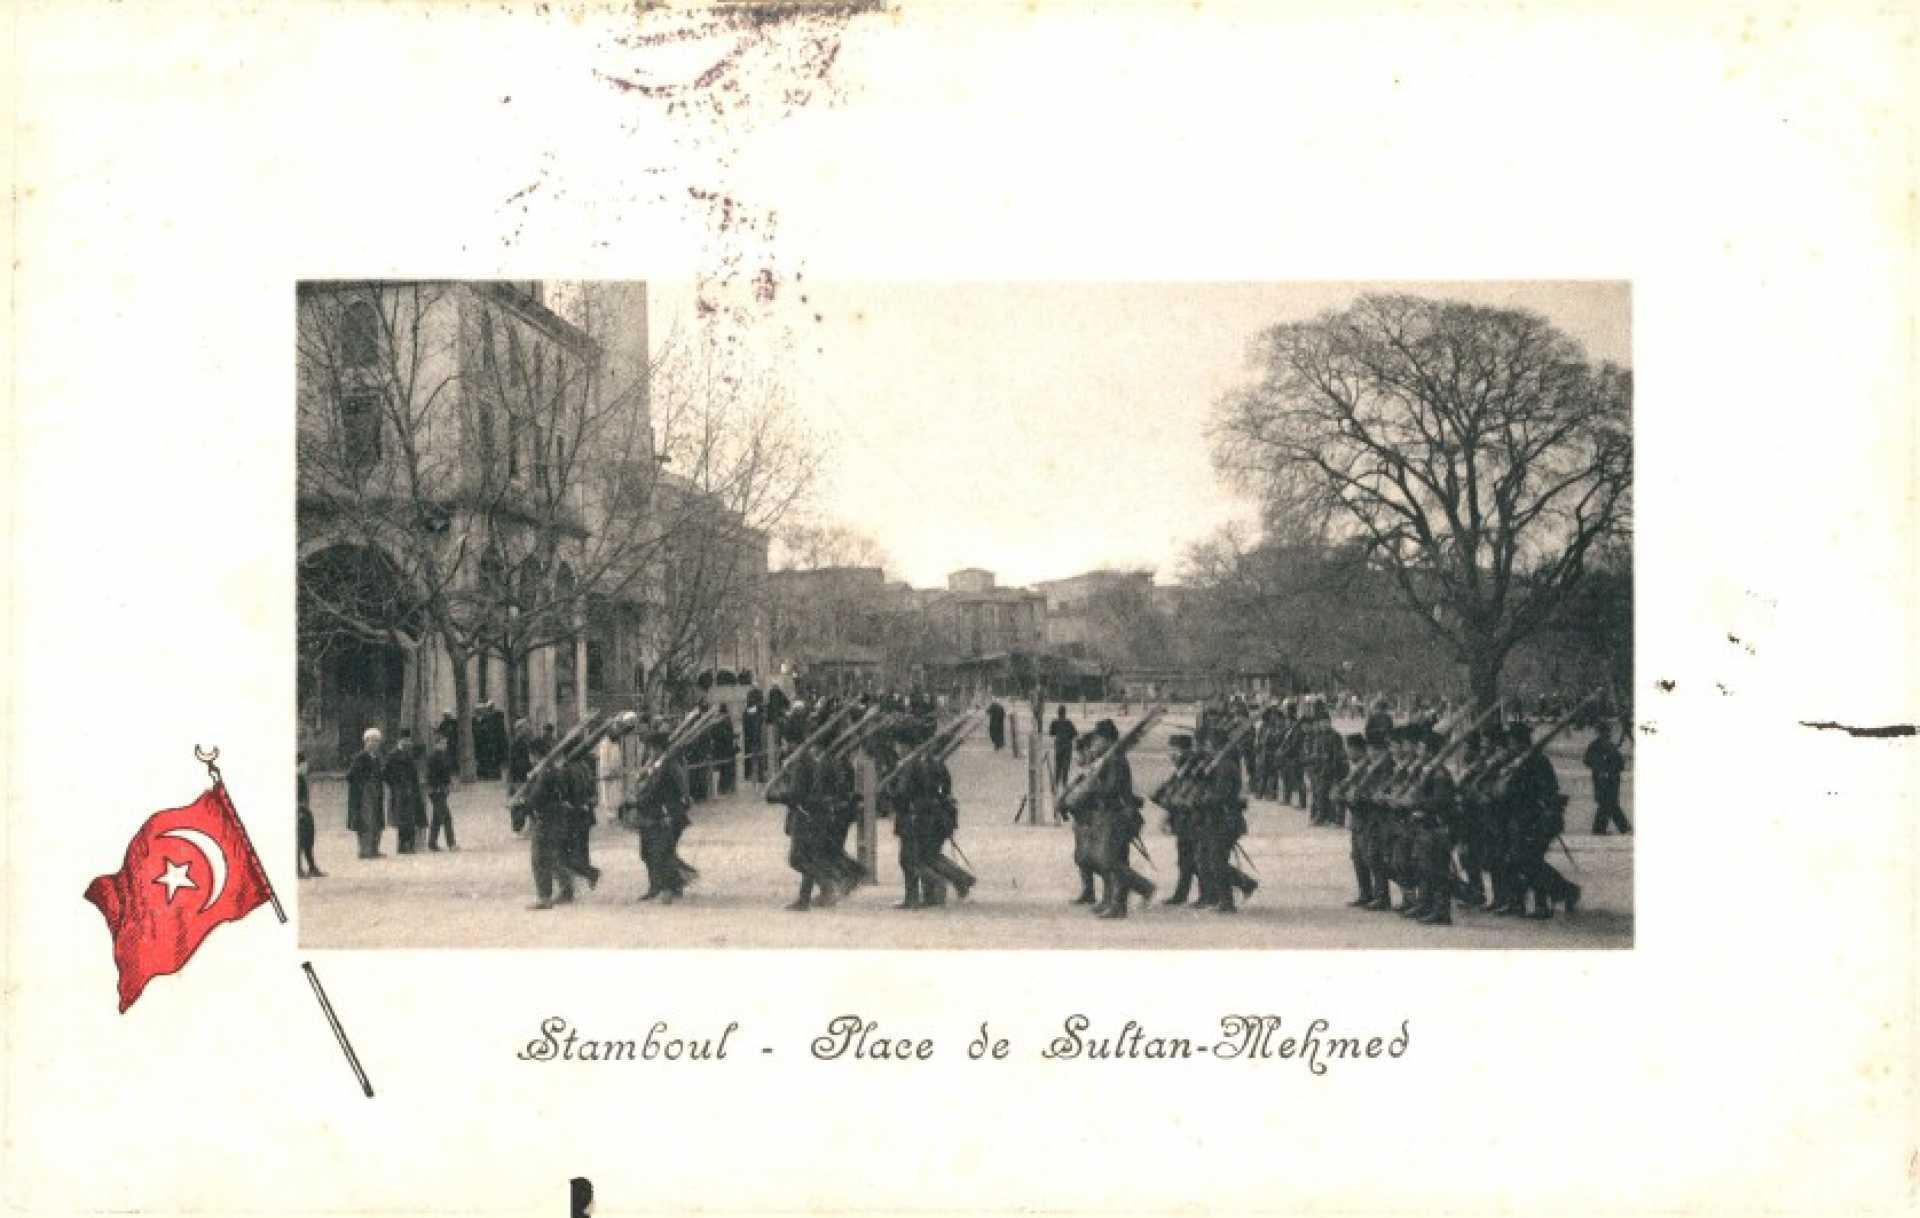 Place de Sultan-Mehmed